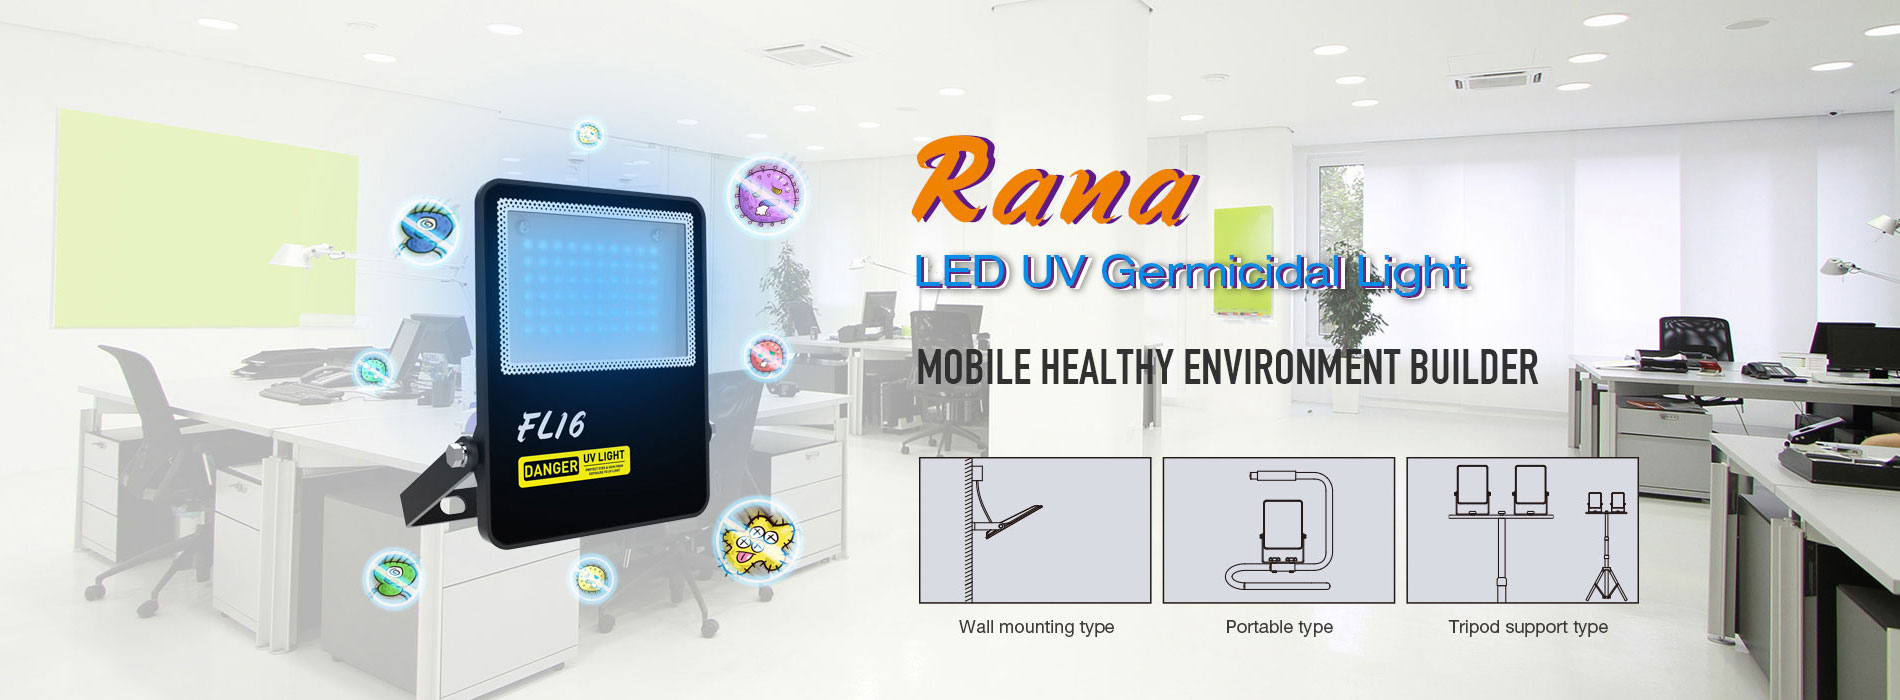 Rana LED UV Germicidal Light